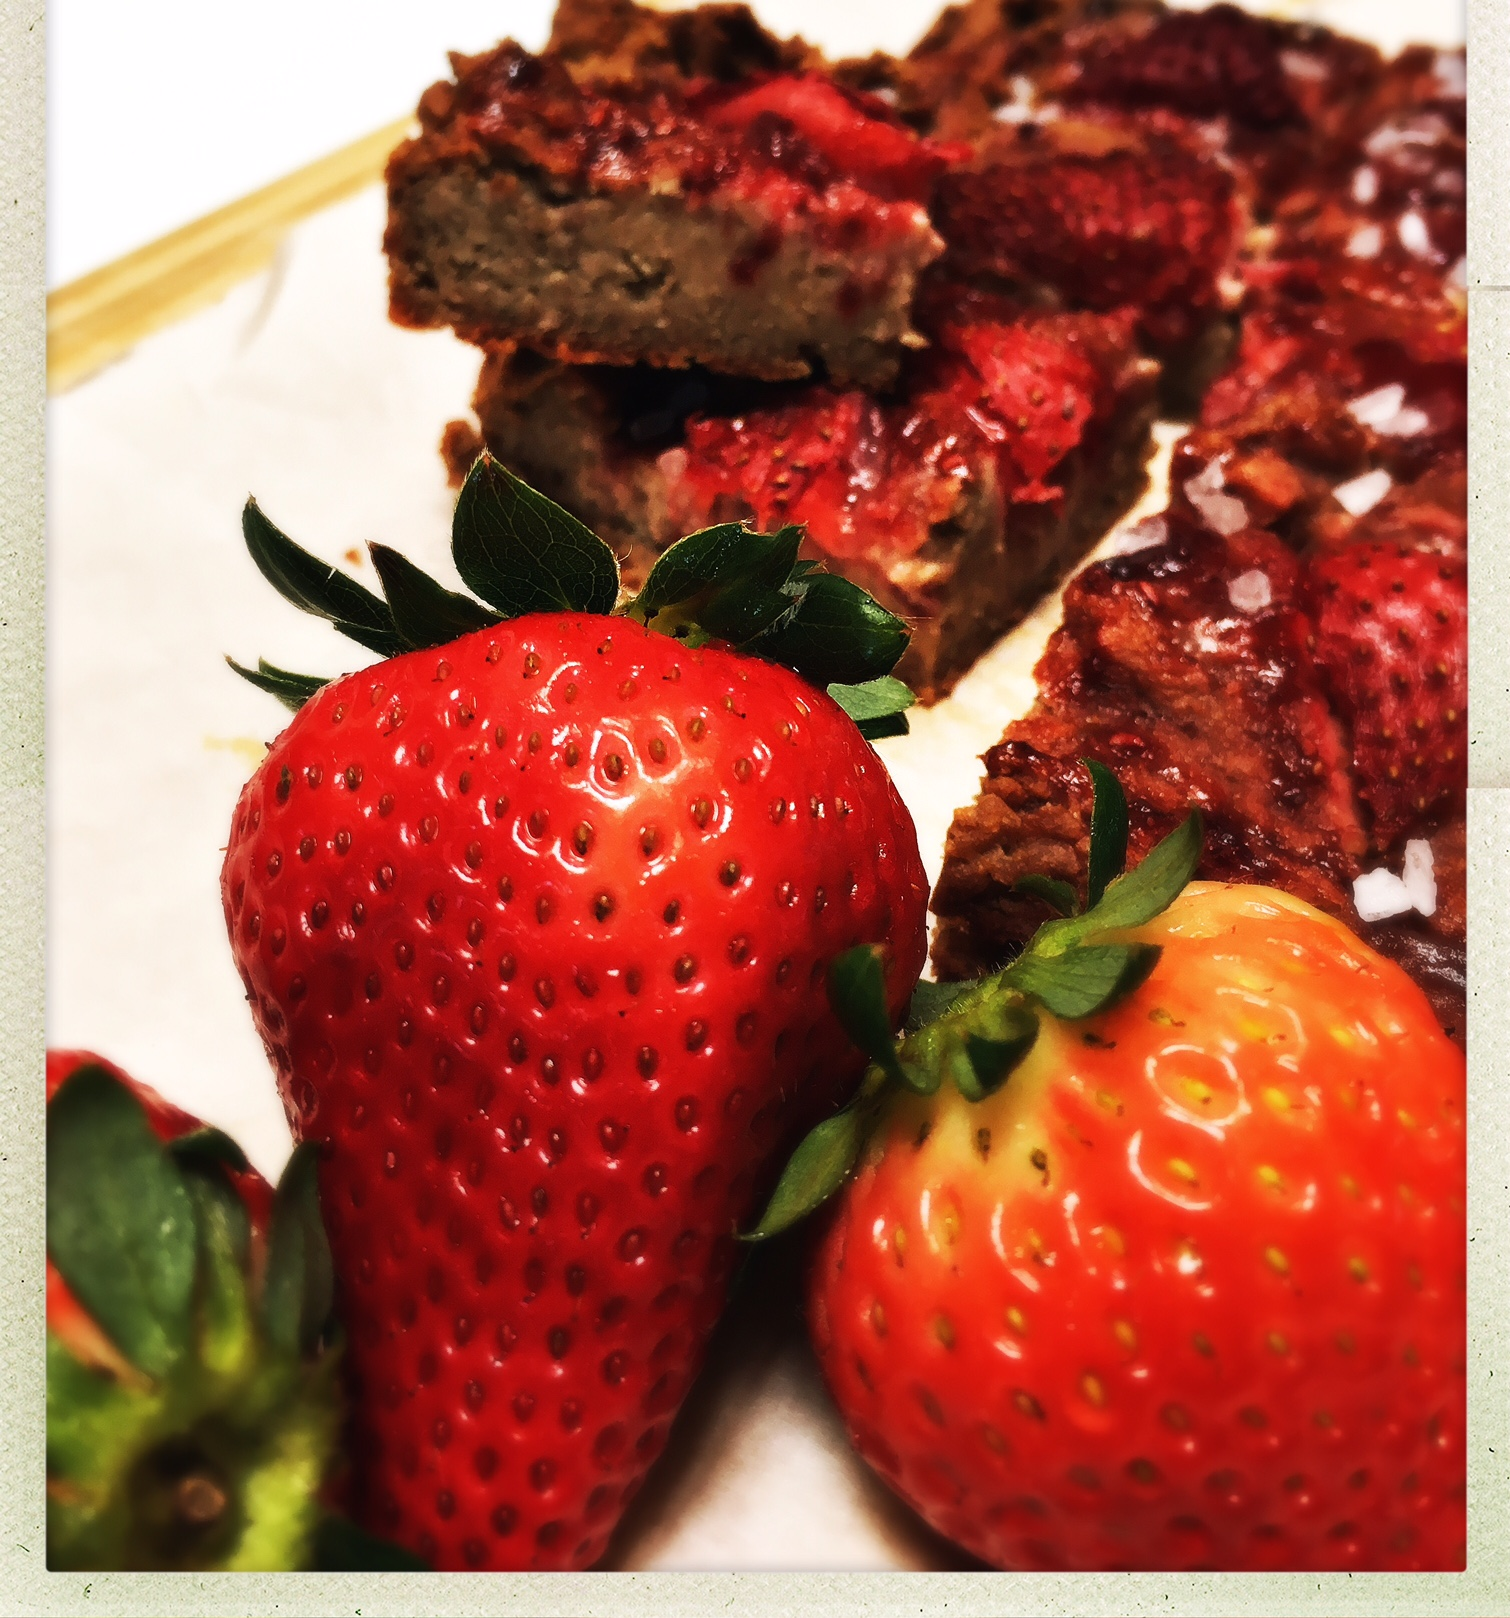 strawberries with bars.jpg